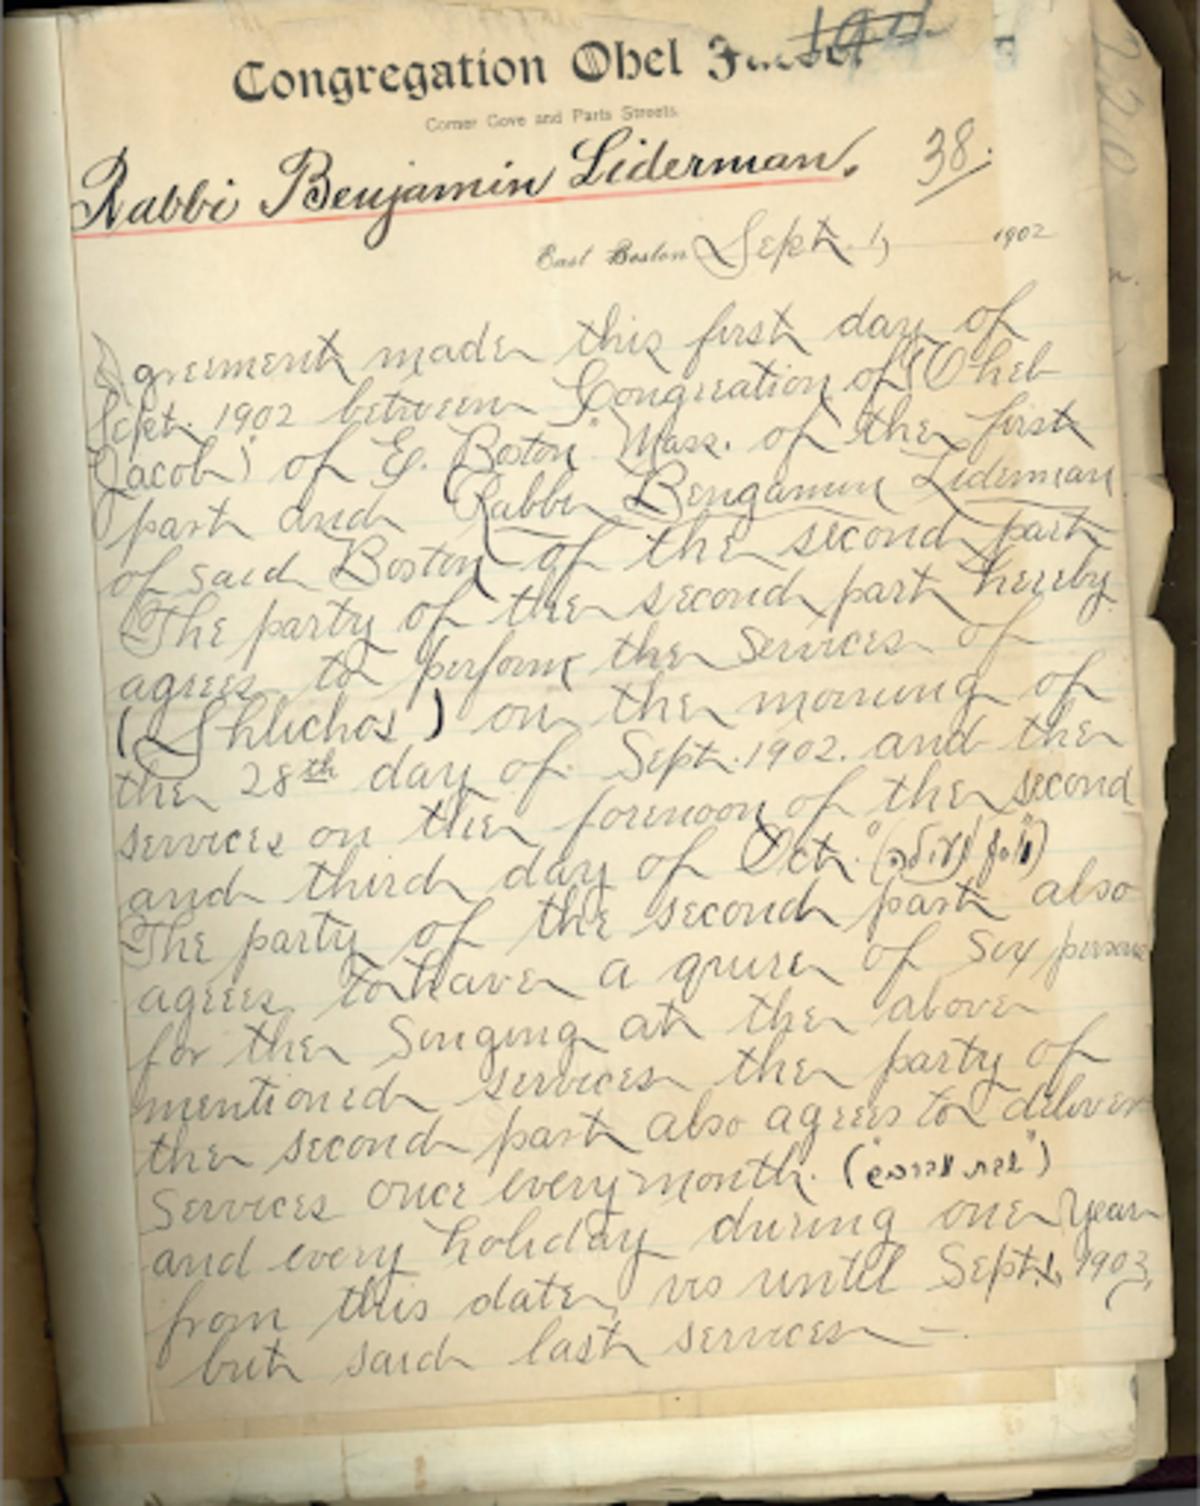 Certificate for Rabbi Benjamin Liderman, September 1902, part of Rabbi certificates, 1893/1911 (page 33), Boston City Archives